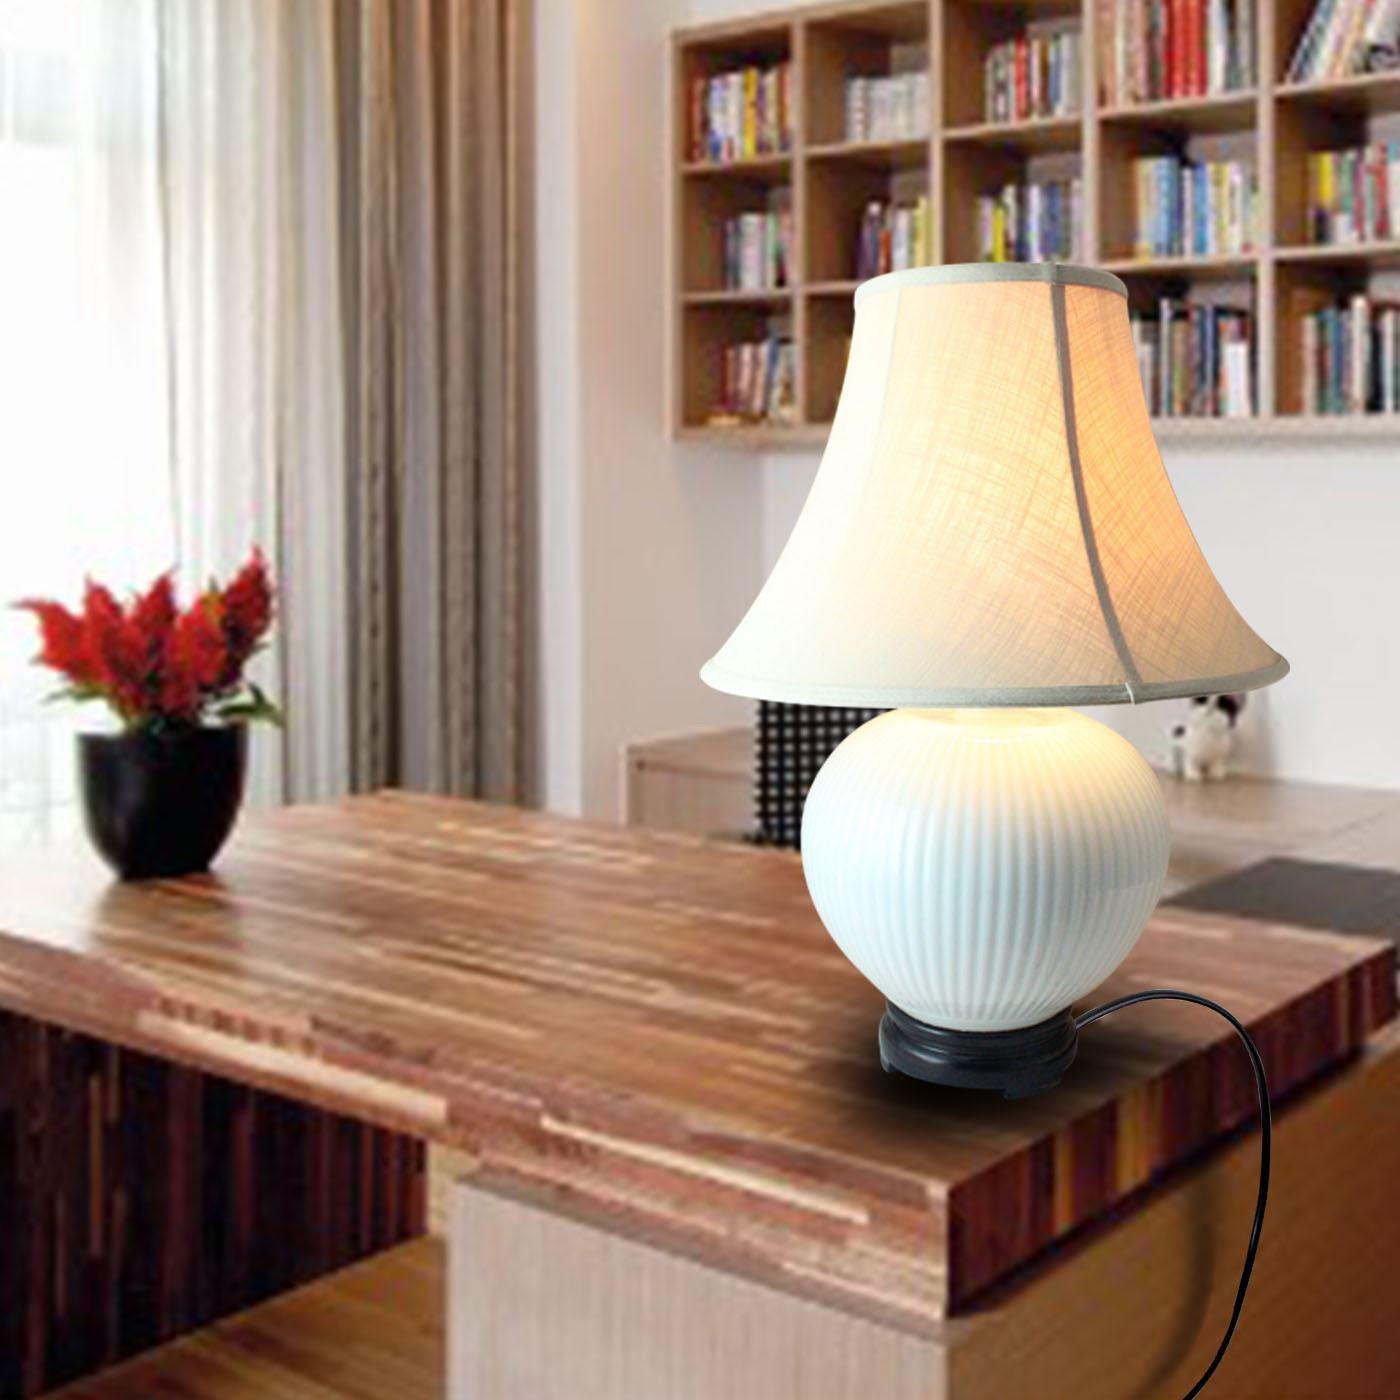 DSMA01景德镇 陶瓷 影清雕刻圆球 台灯 灯具 灯饰 家居摆设